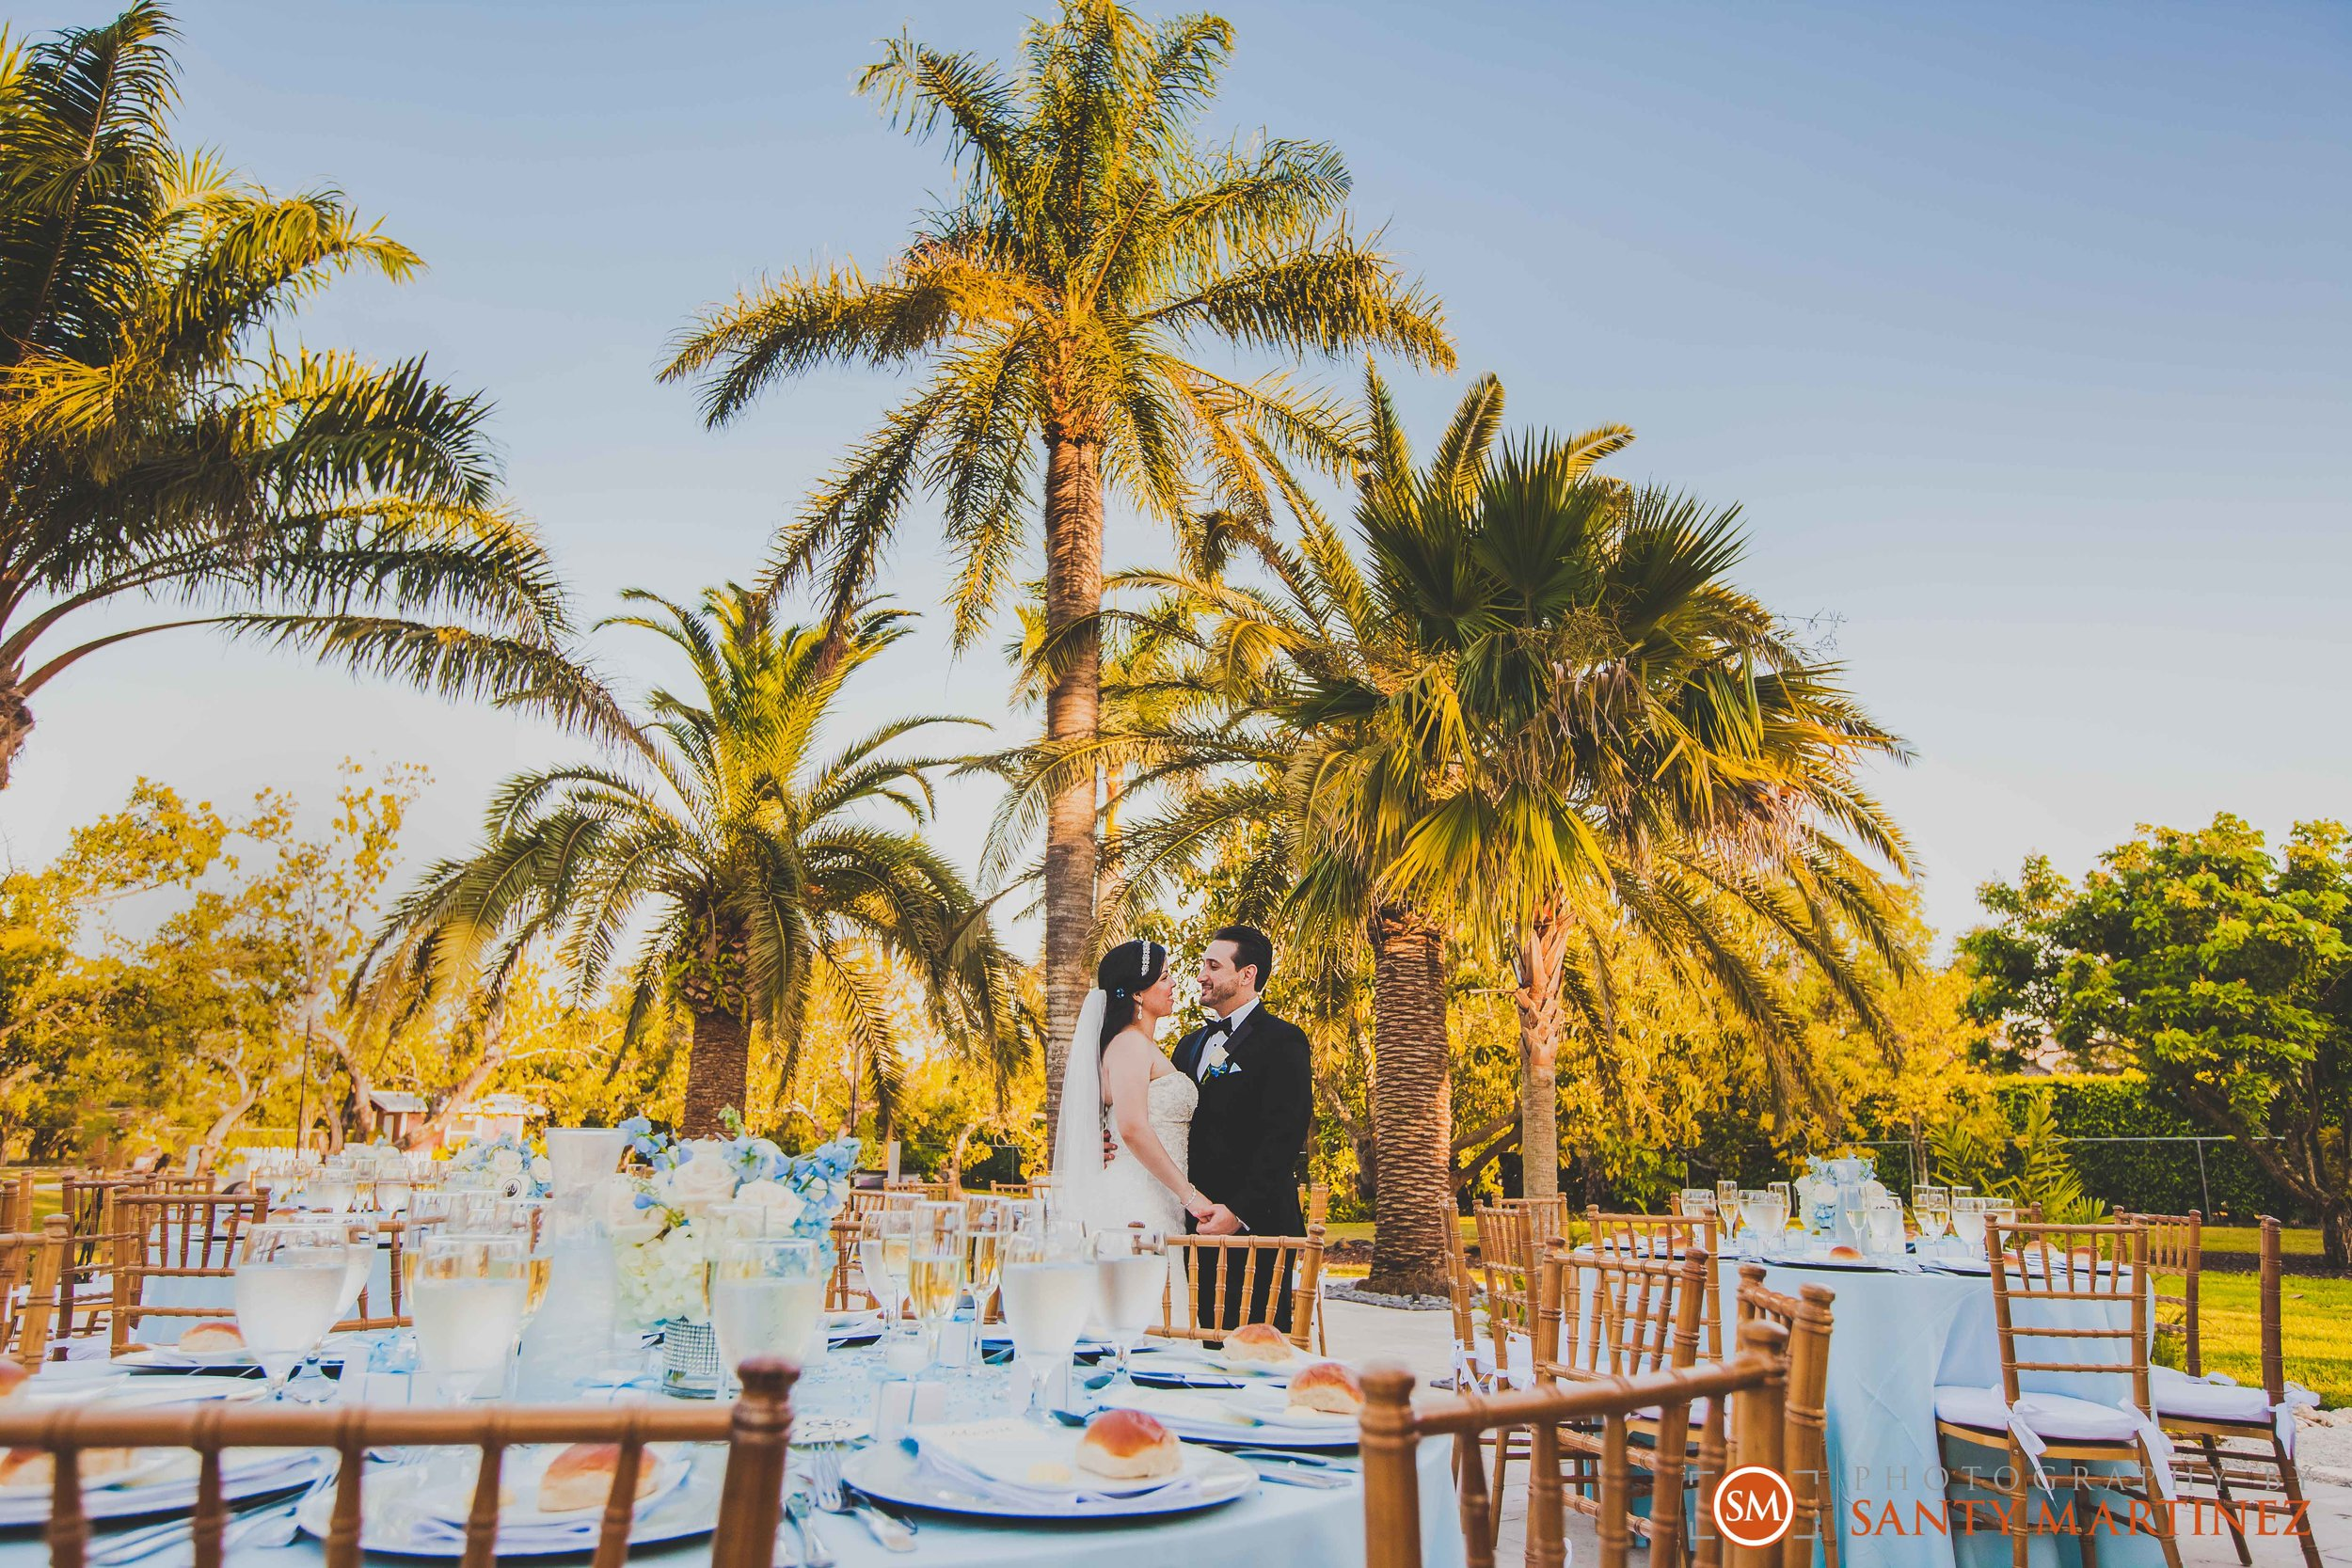 Wedding - Whimsical key West House - Photography by Santy Martinez-33.jpg